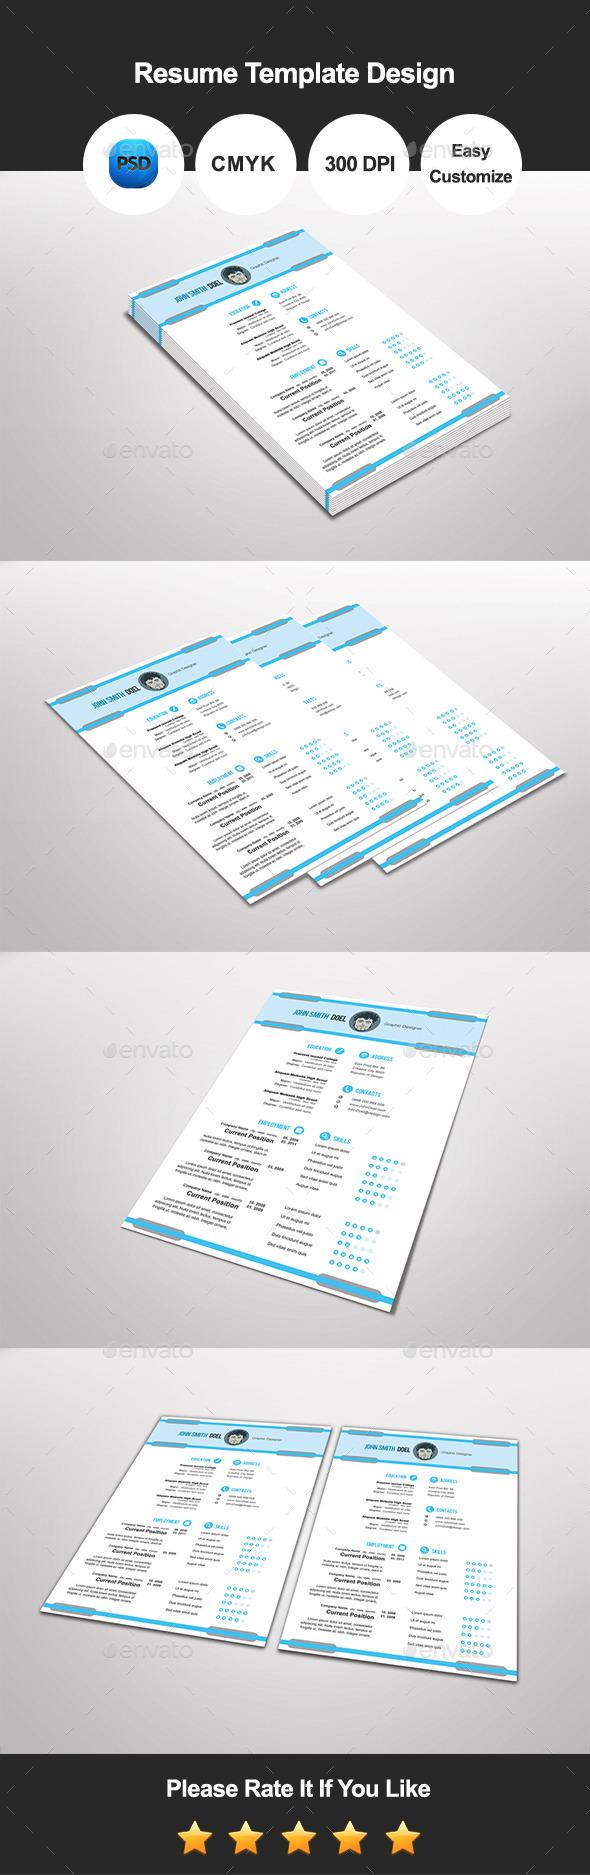 Prevatic Resume Template Design